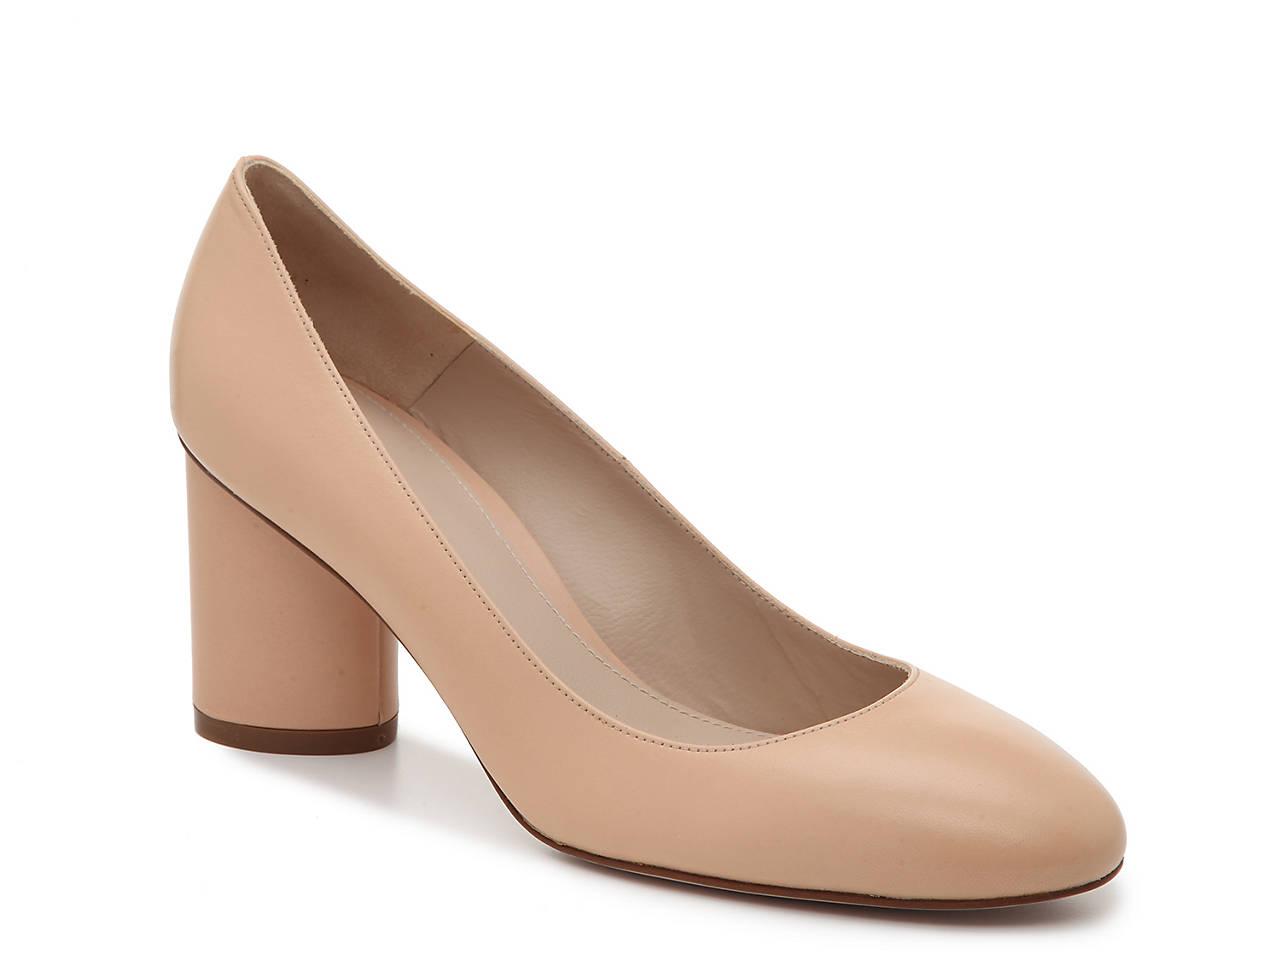 5387c32fb9a Stuart Weitzman Azalea Pump Women s Shoes